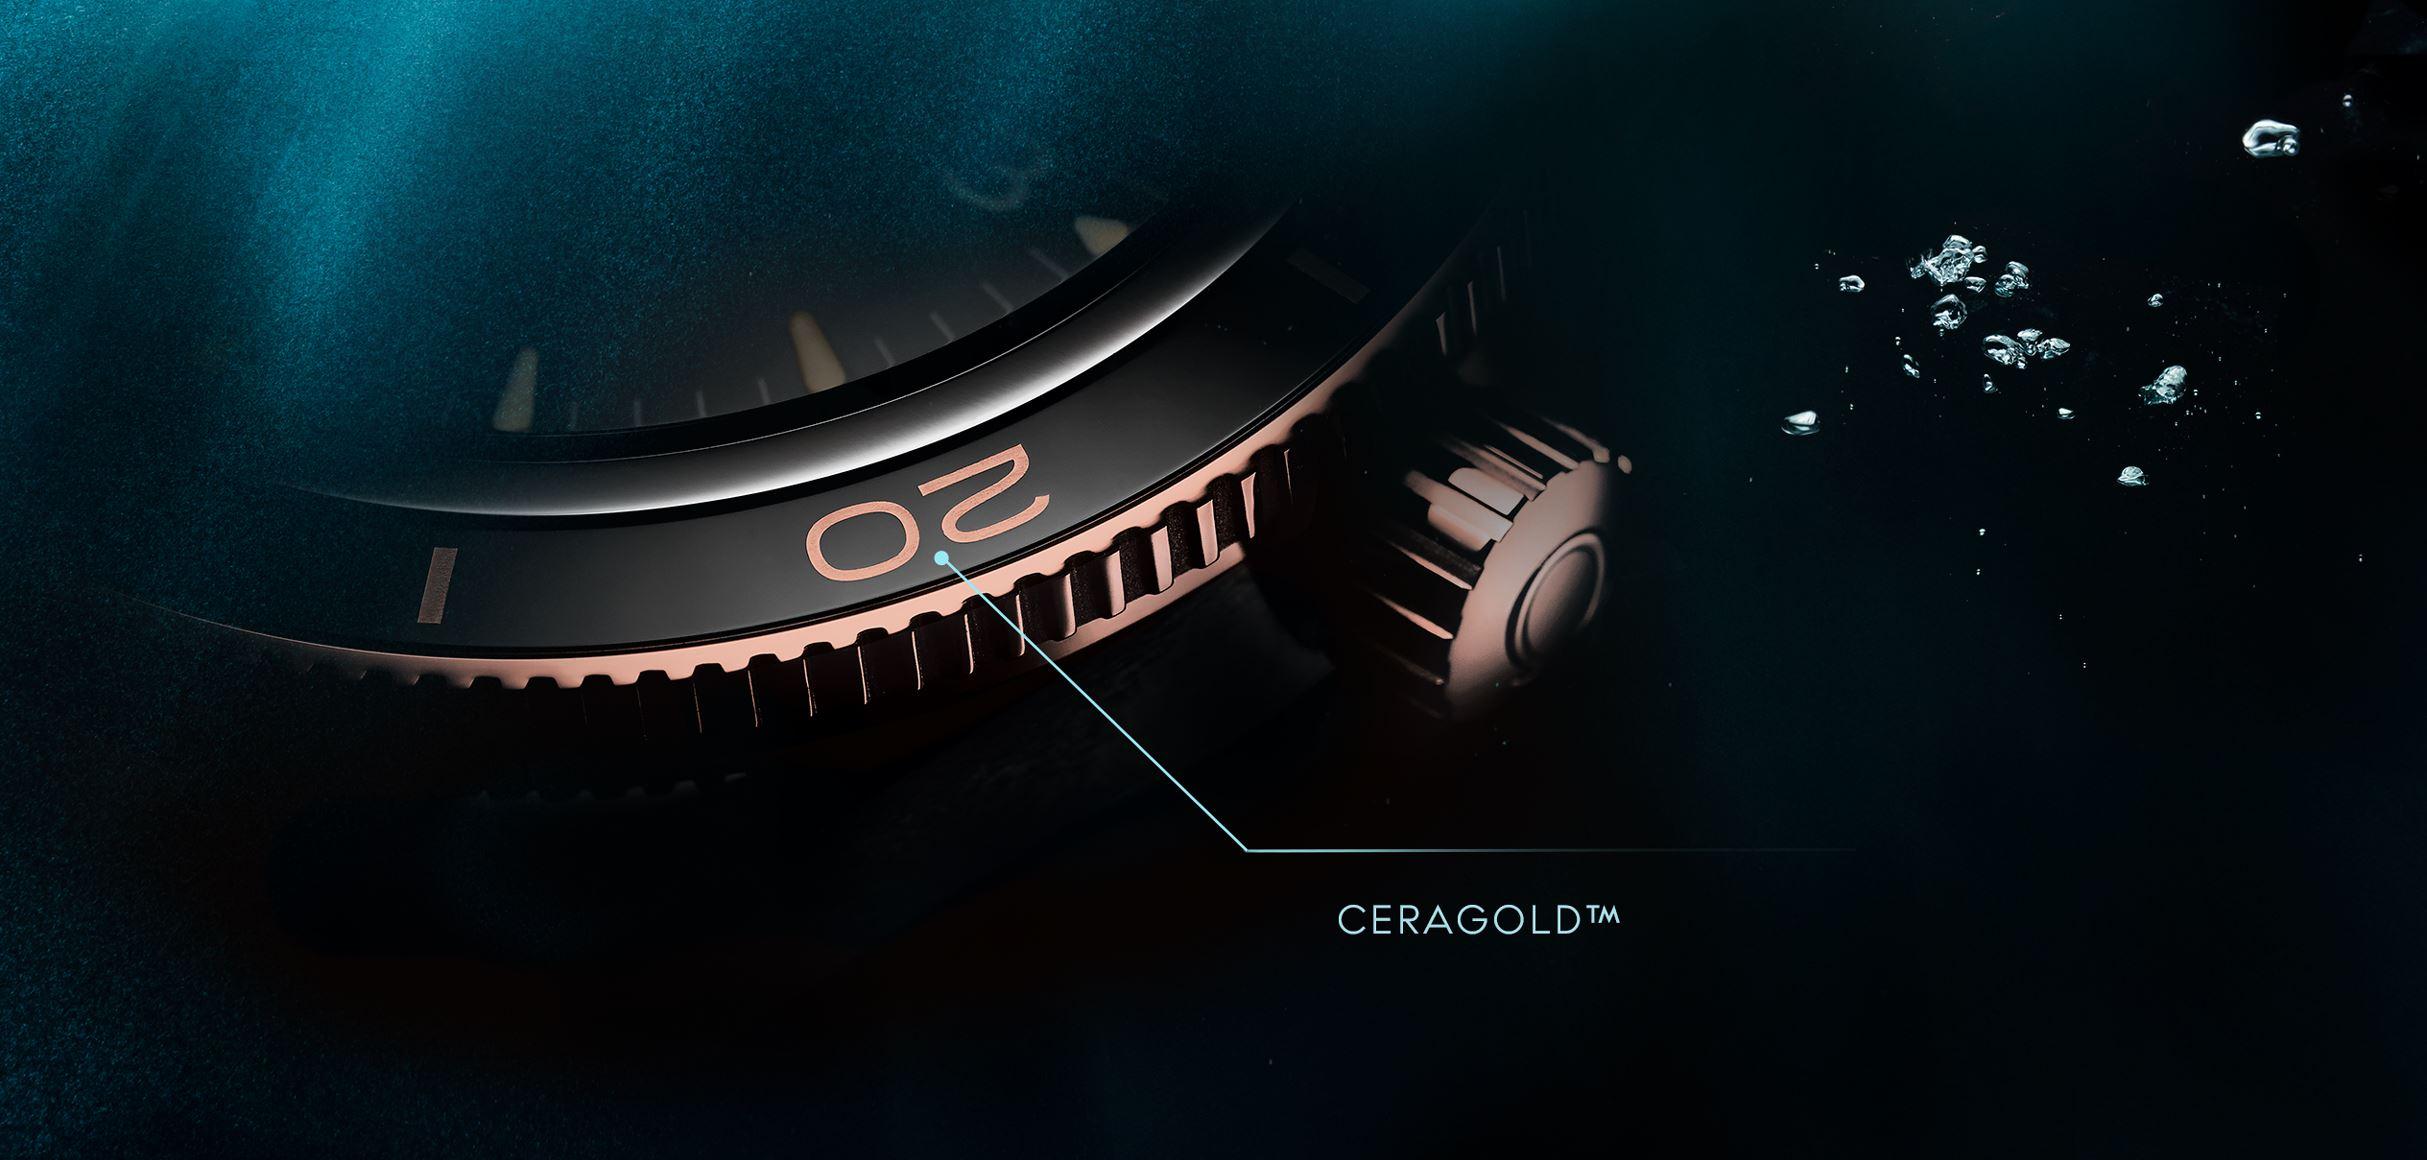 Omega Seamaster CK2913 Reissue BaselWorld 2014 Ace Jewelers (2)